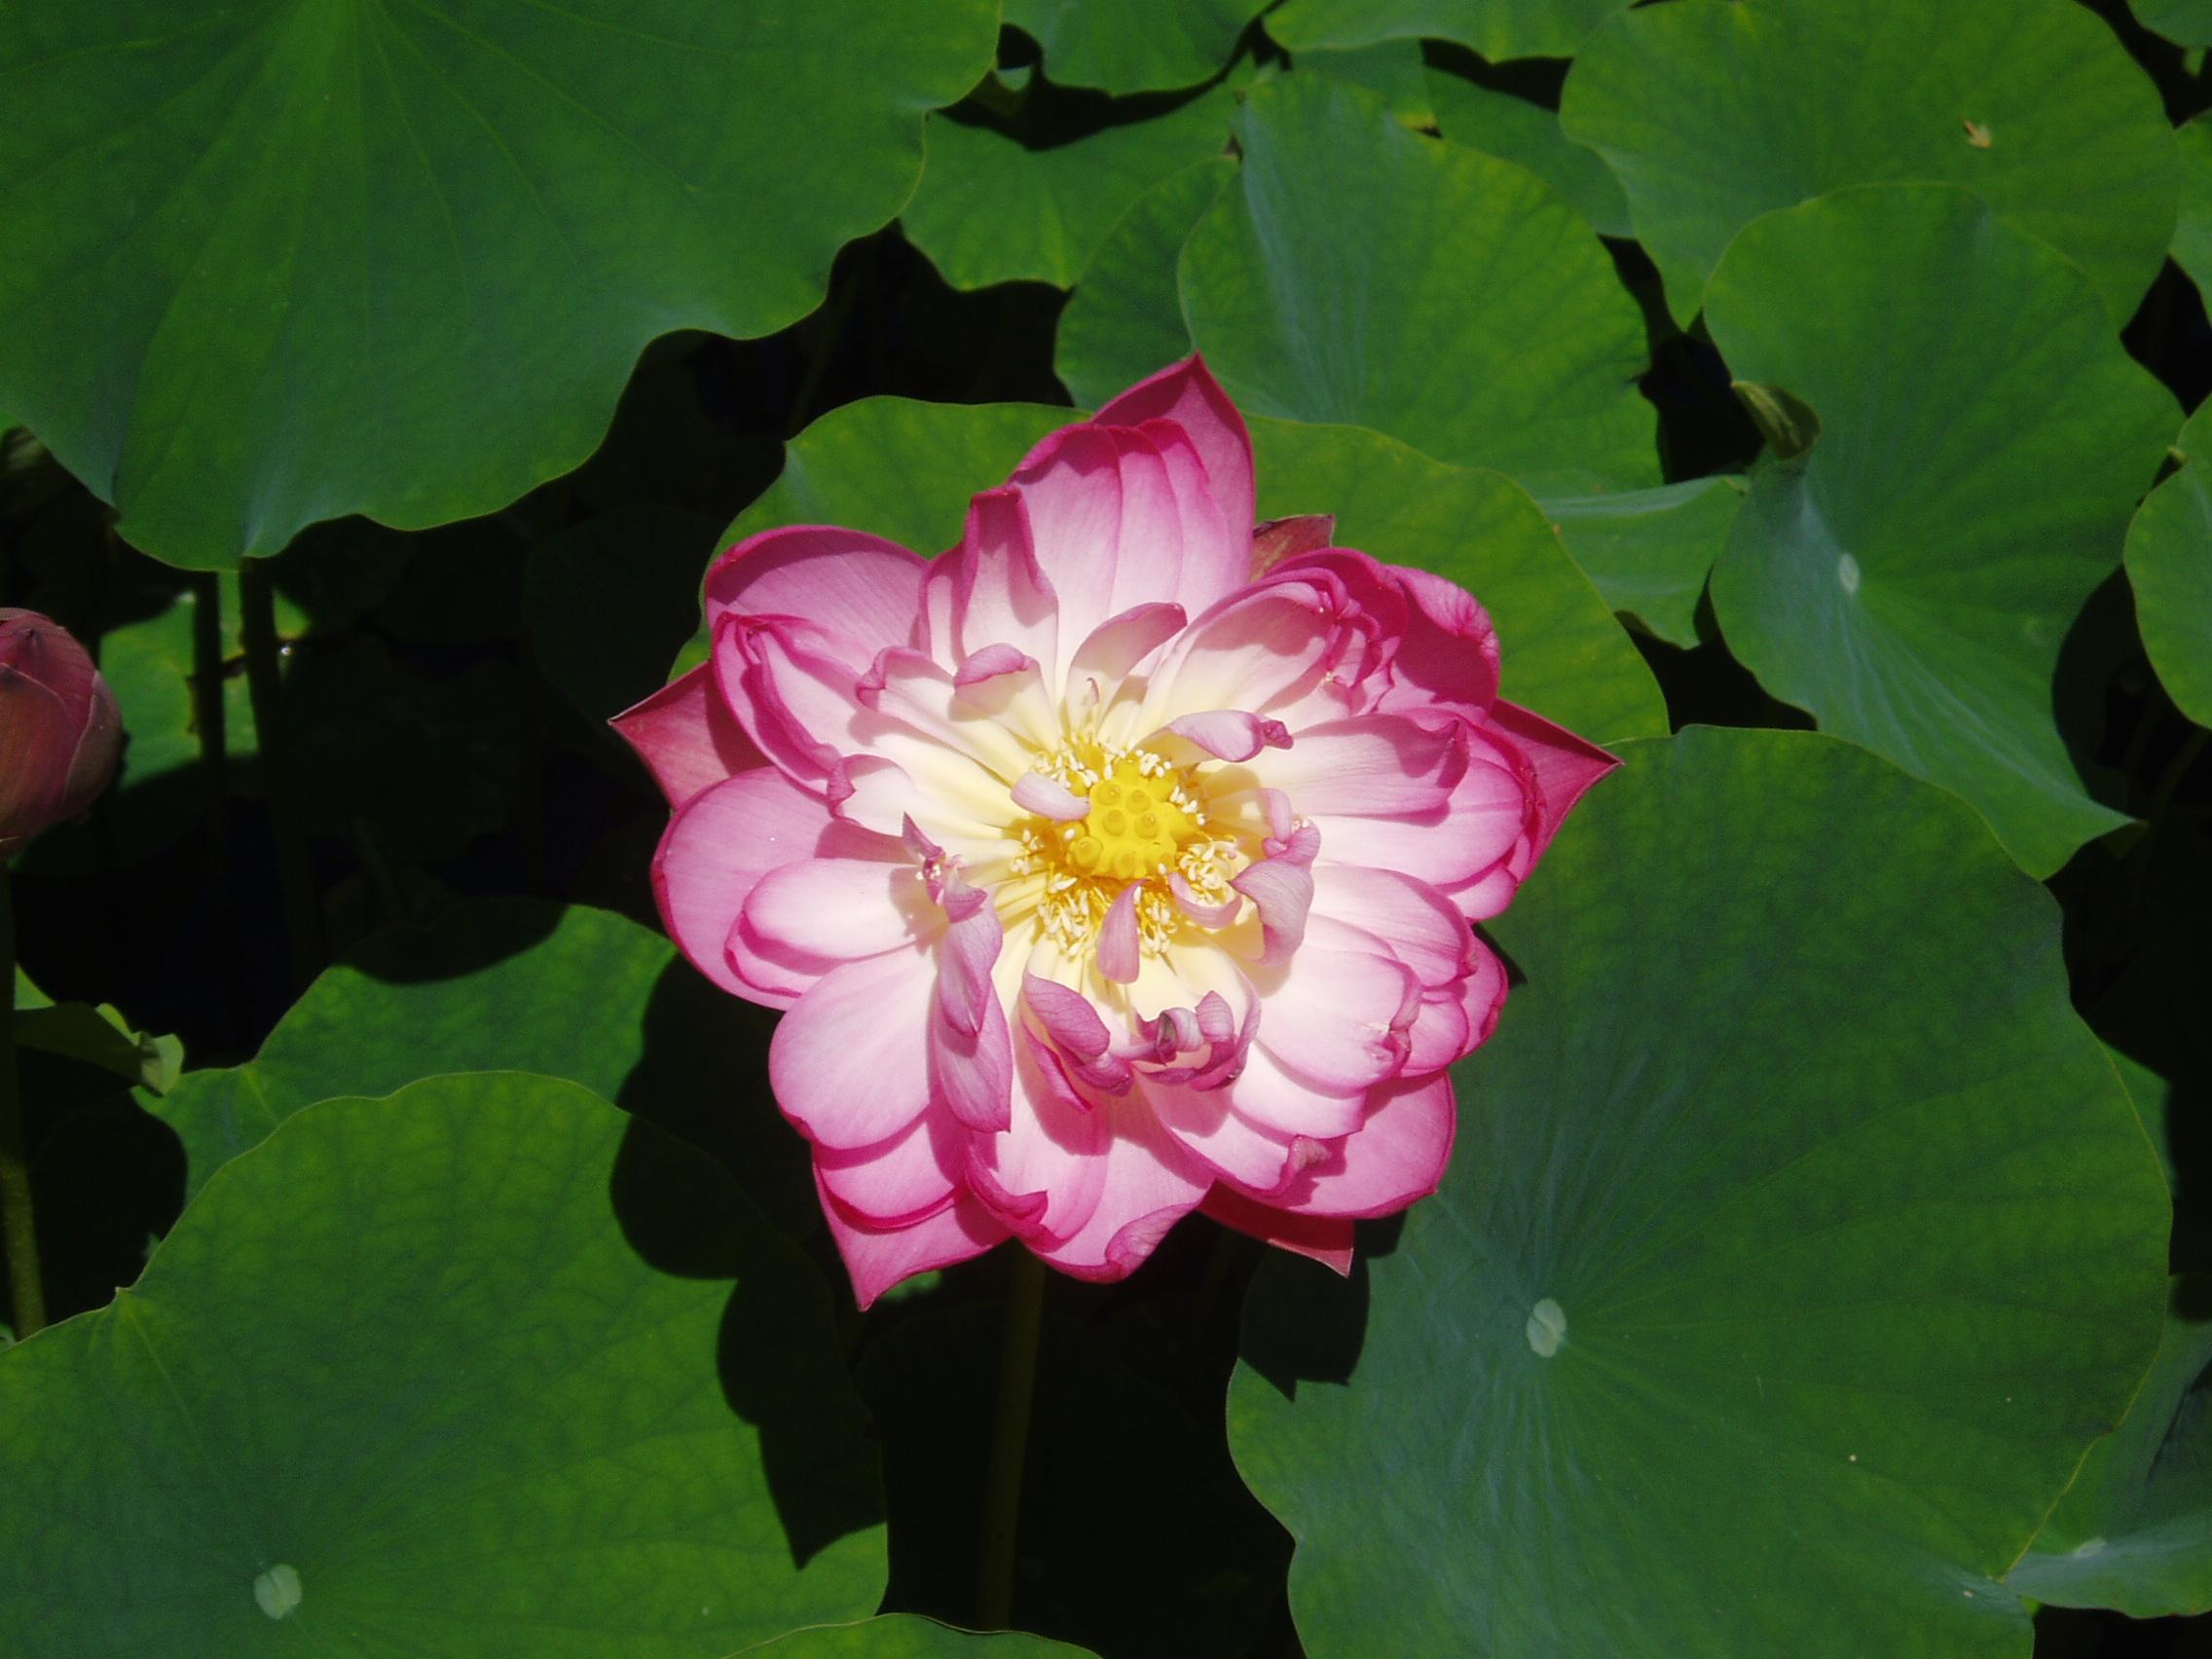 File:Loto rosa malaga.jpg - Wikimedia Commons